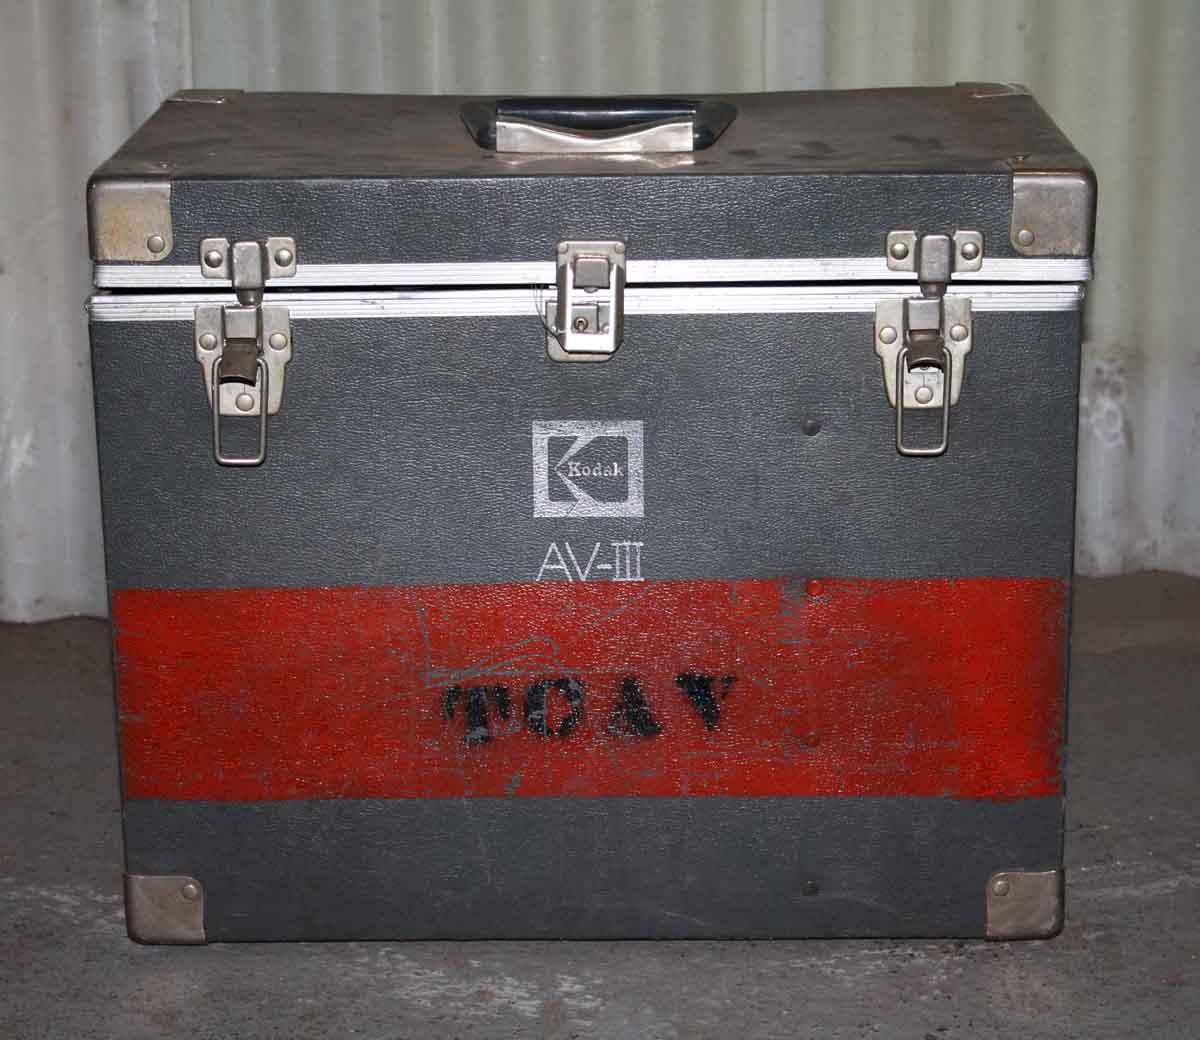 Kodak Av-Iii Slide Projector Case